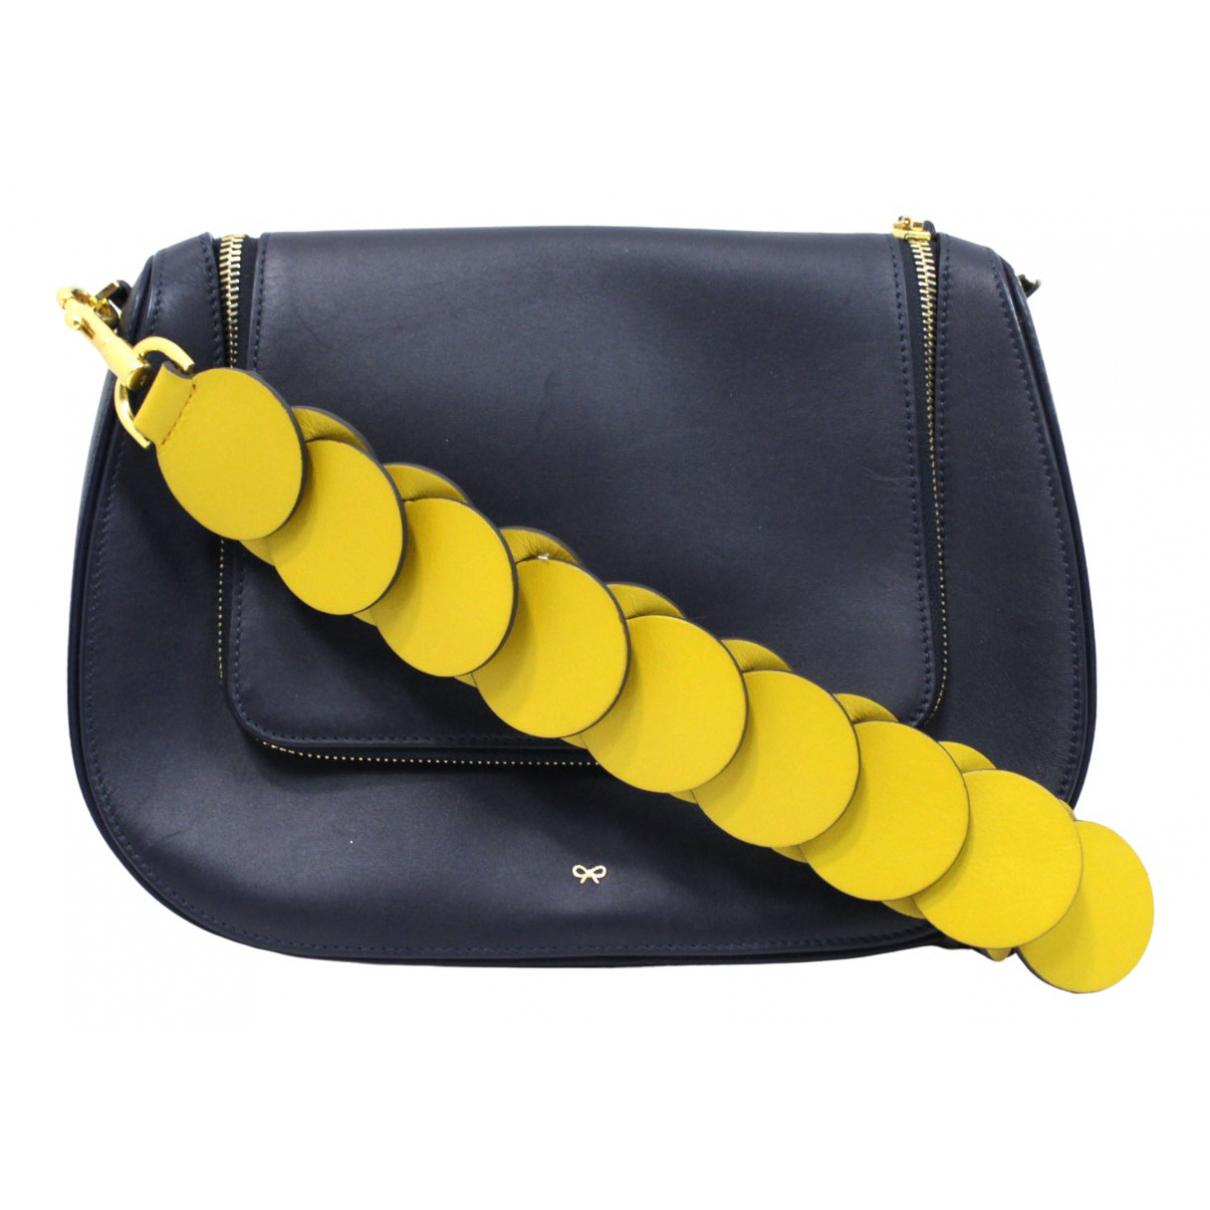 Anya Hindmarch N Navy Leather handbag for Women N